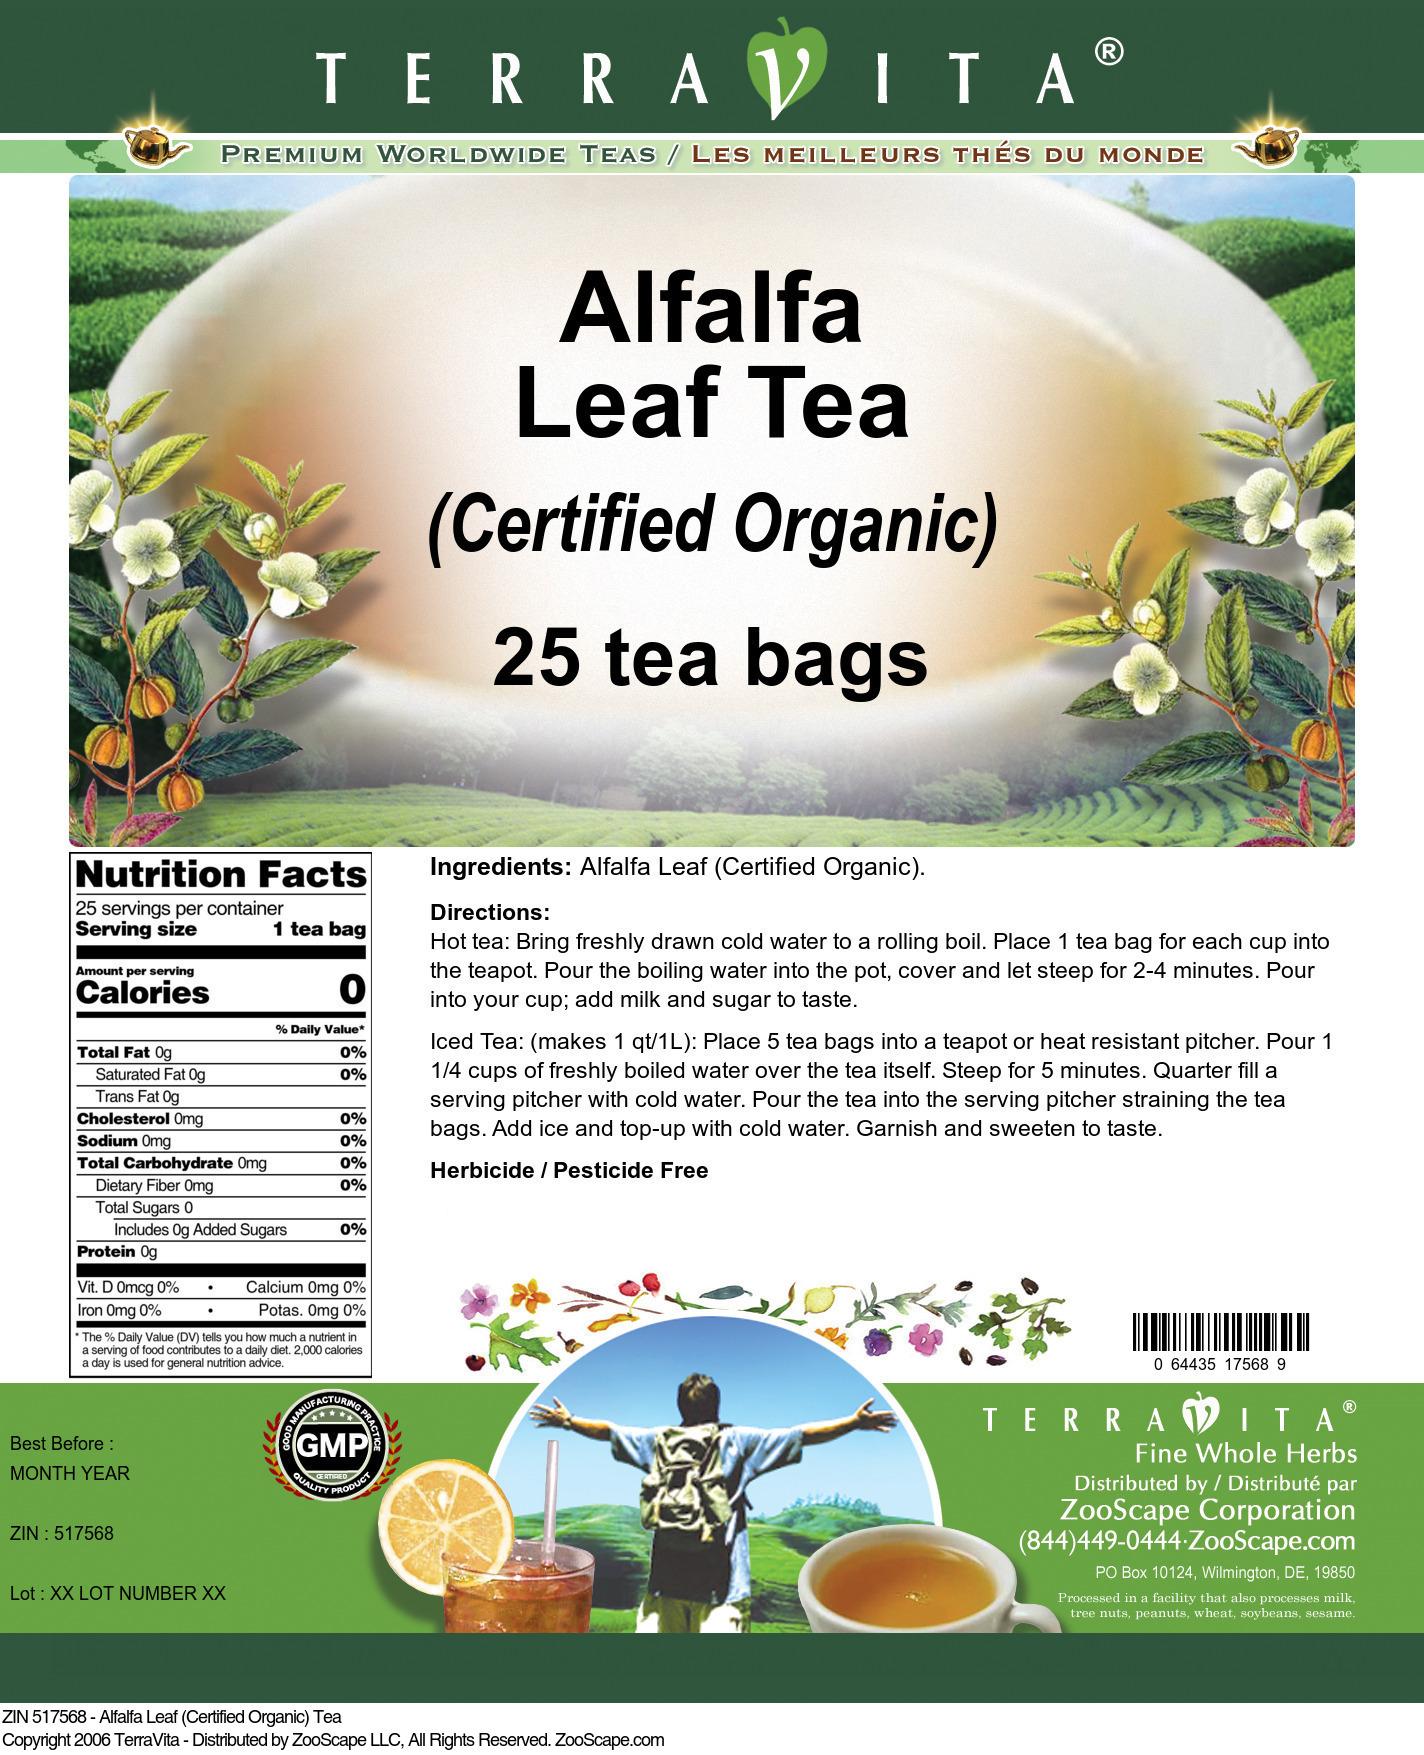 Alfalfa Leaf (Certified Organic) Tea